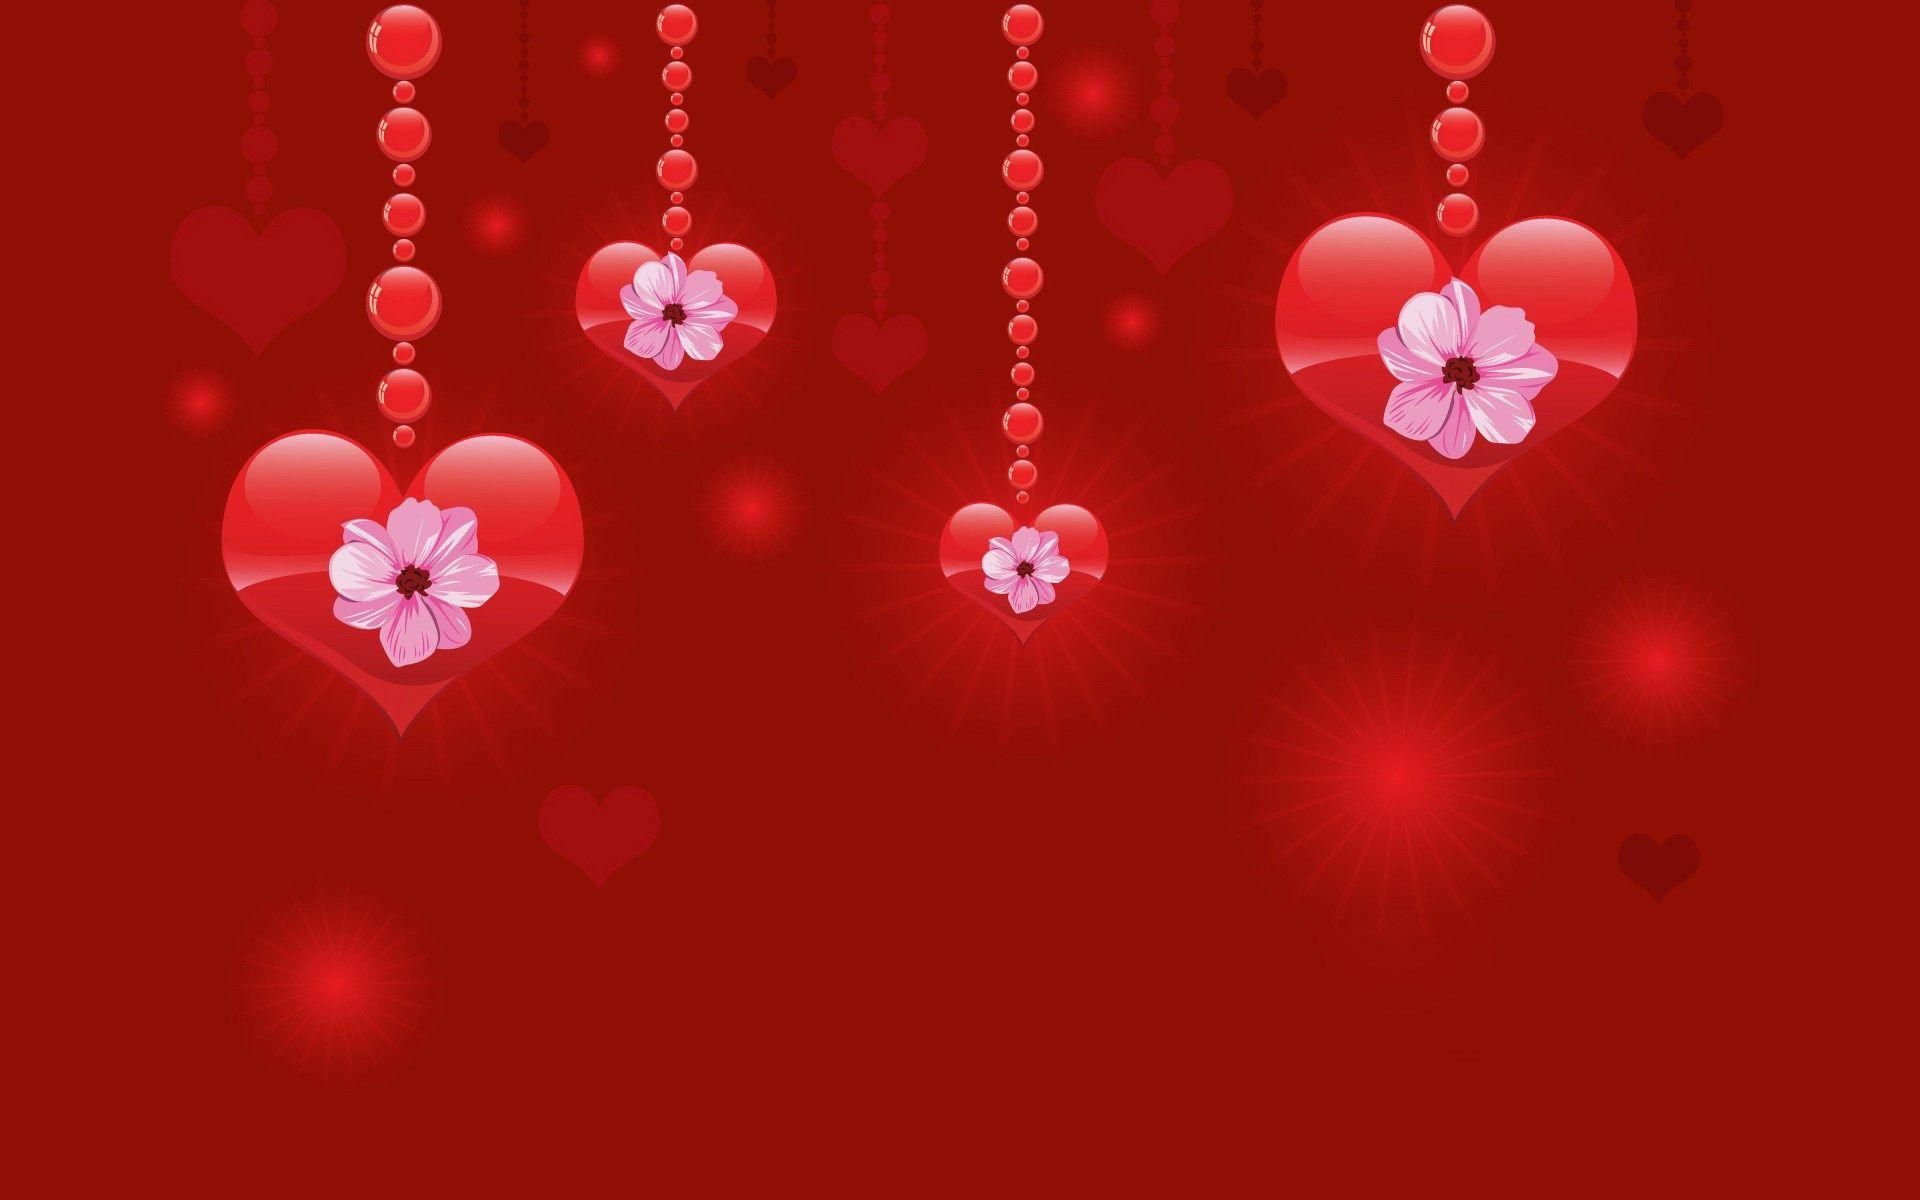 Valentines Desktop Wallpaper On Valentines Day Wallpaper Floral Valentines Wallpaper Valentines Day Background Happy Valentines Day Pictures